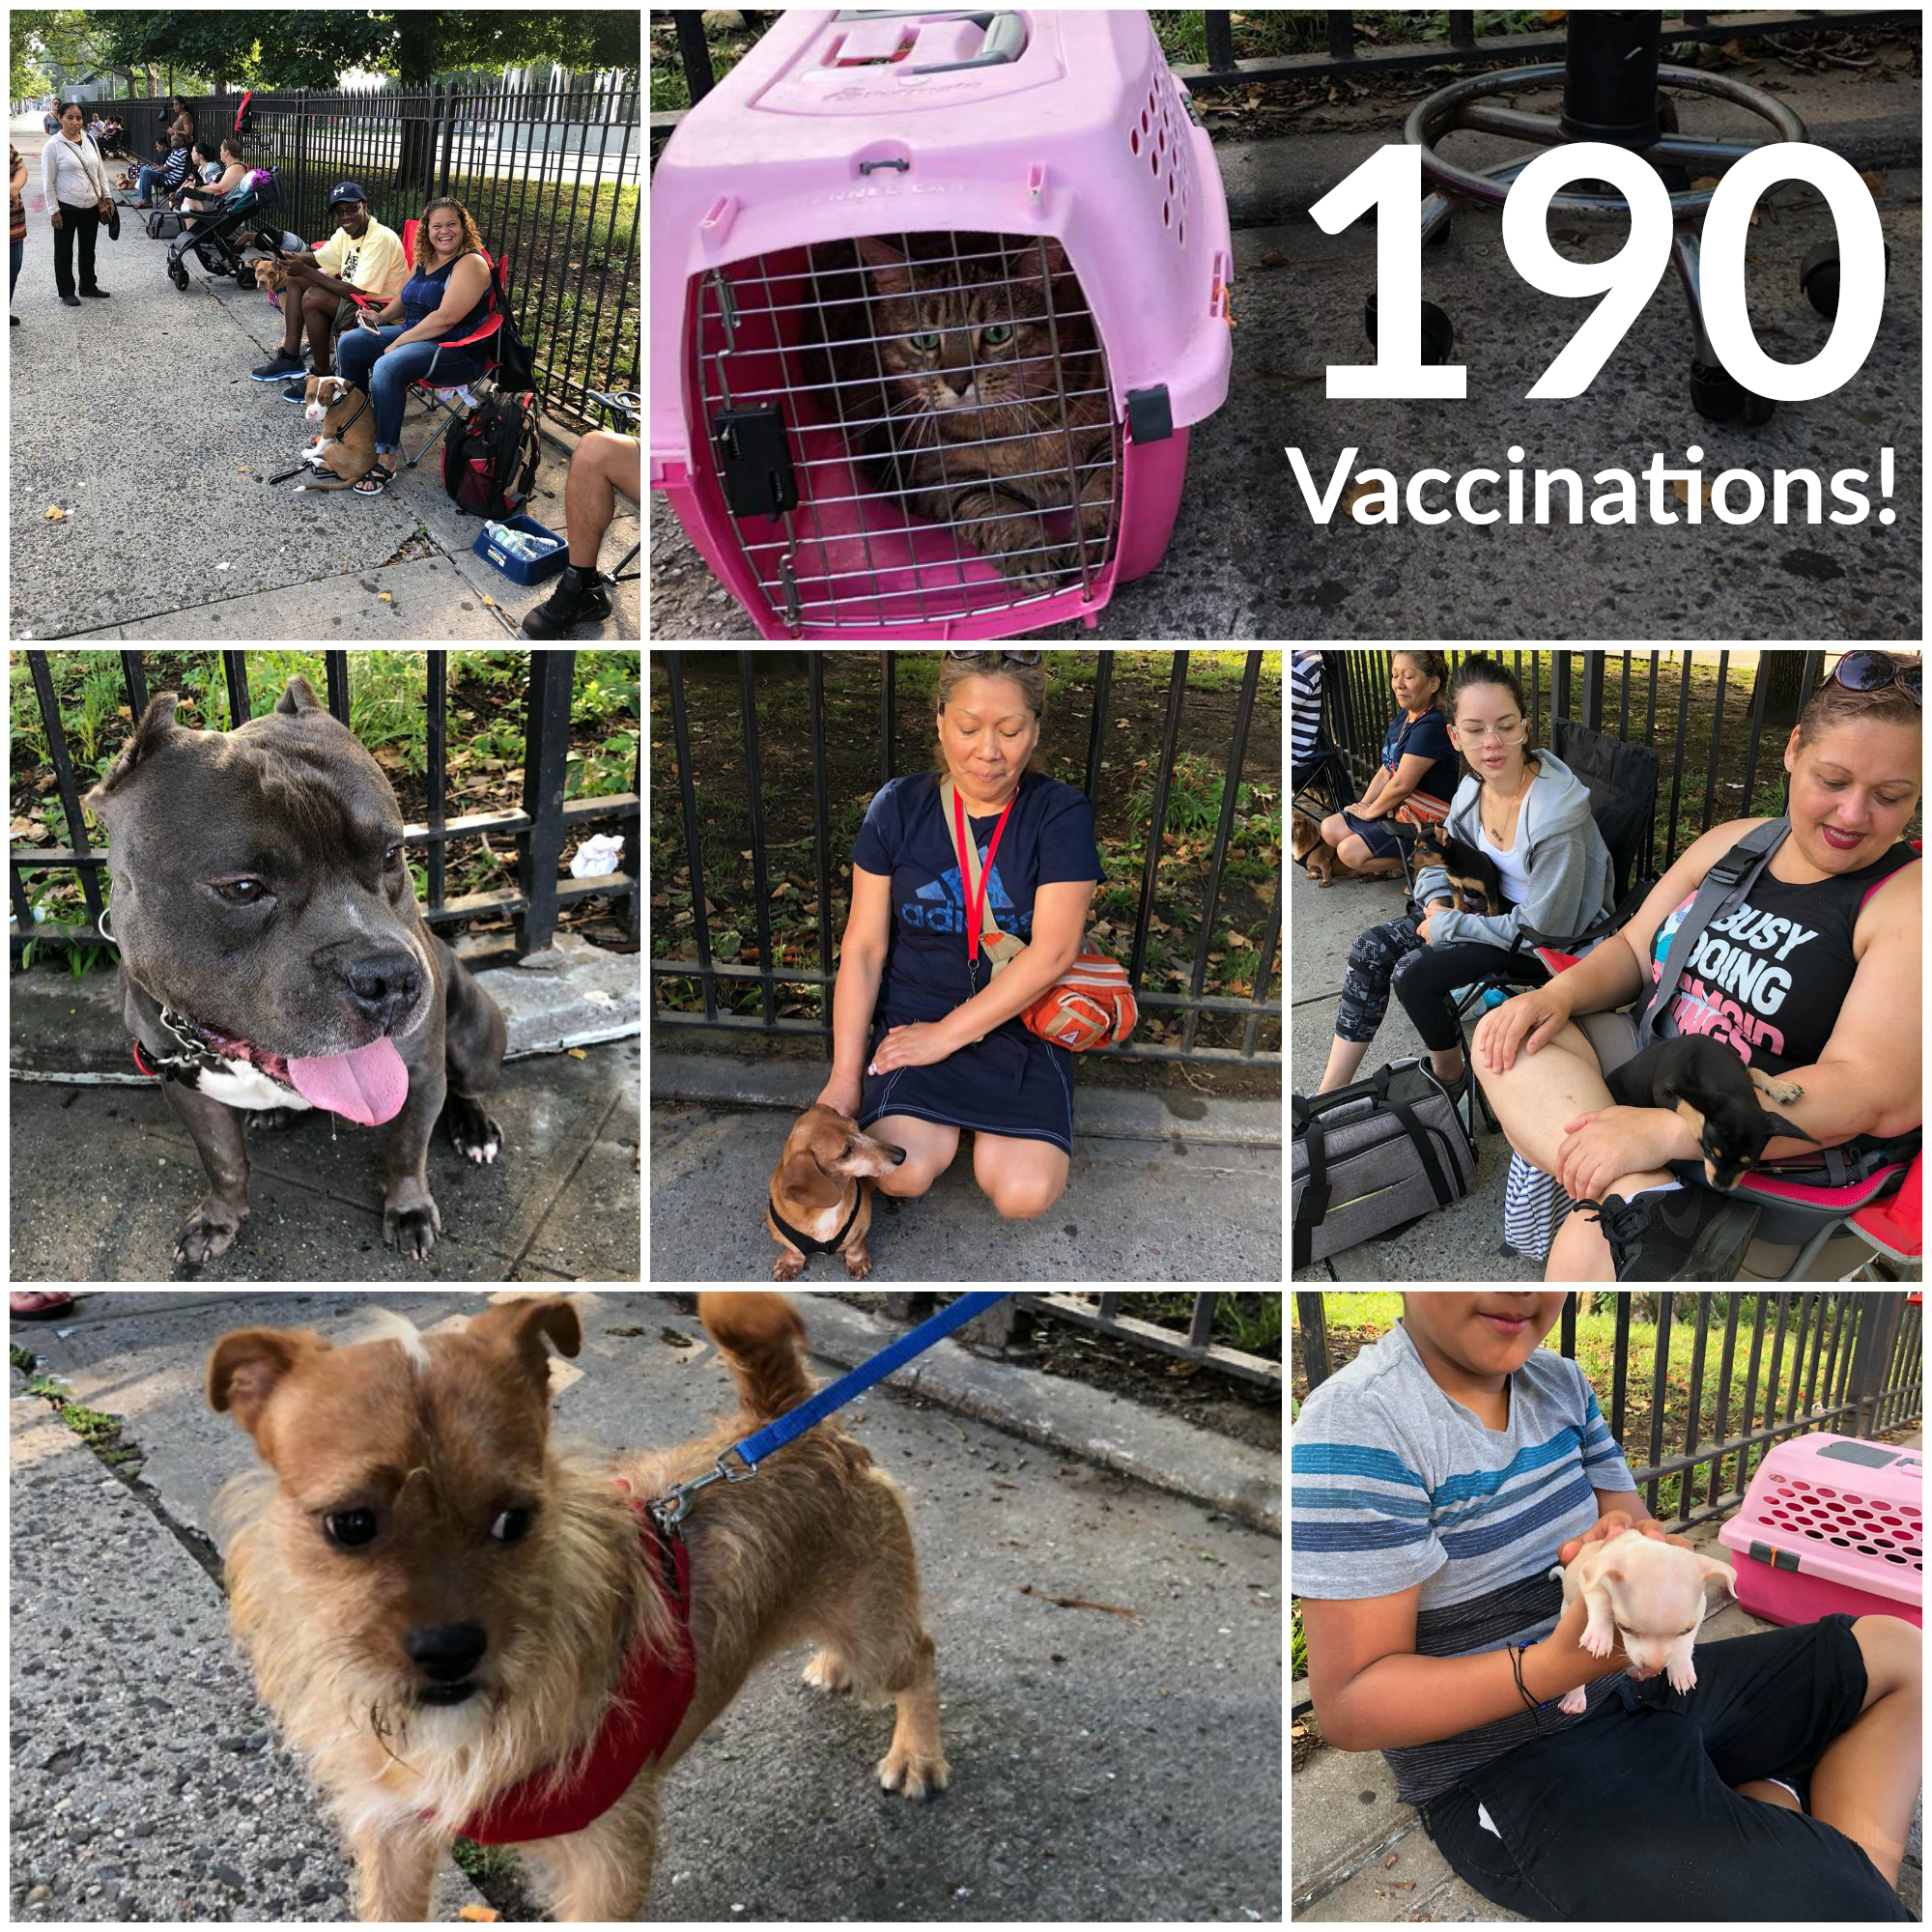 Poe Park Vaccination